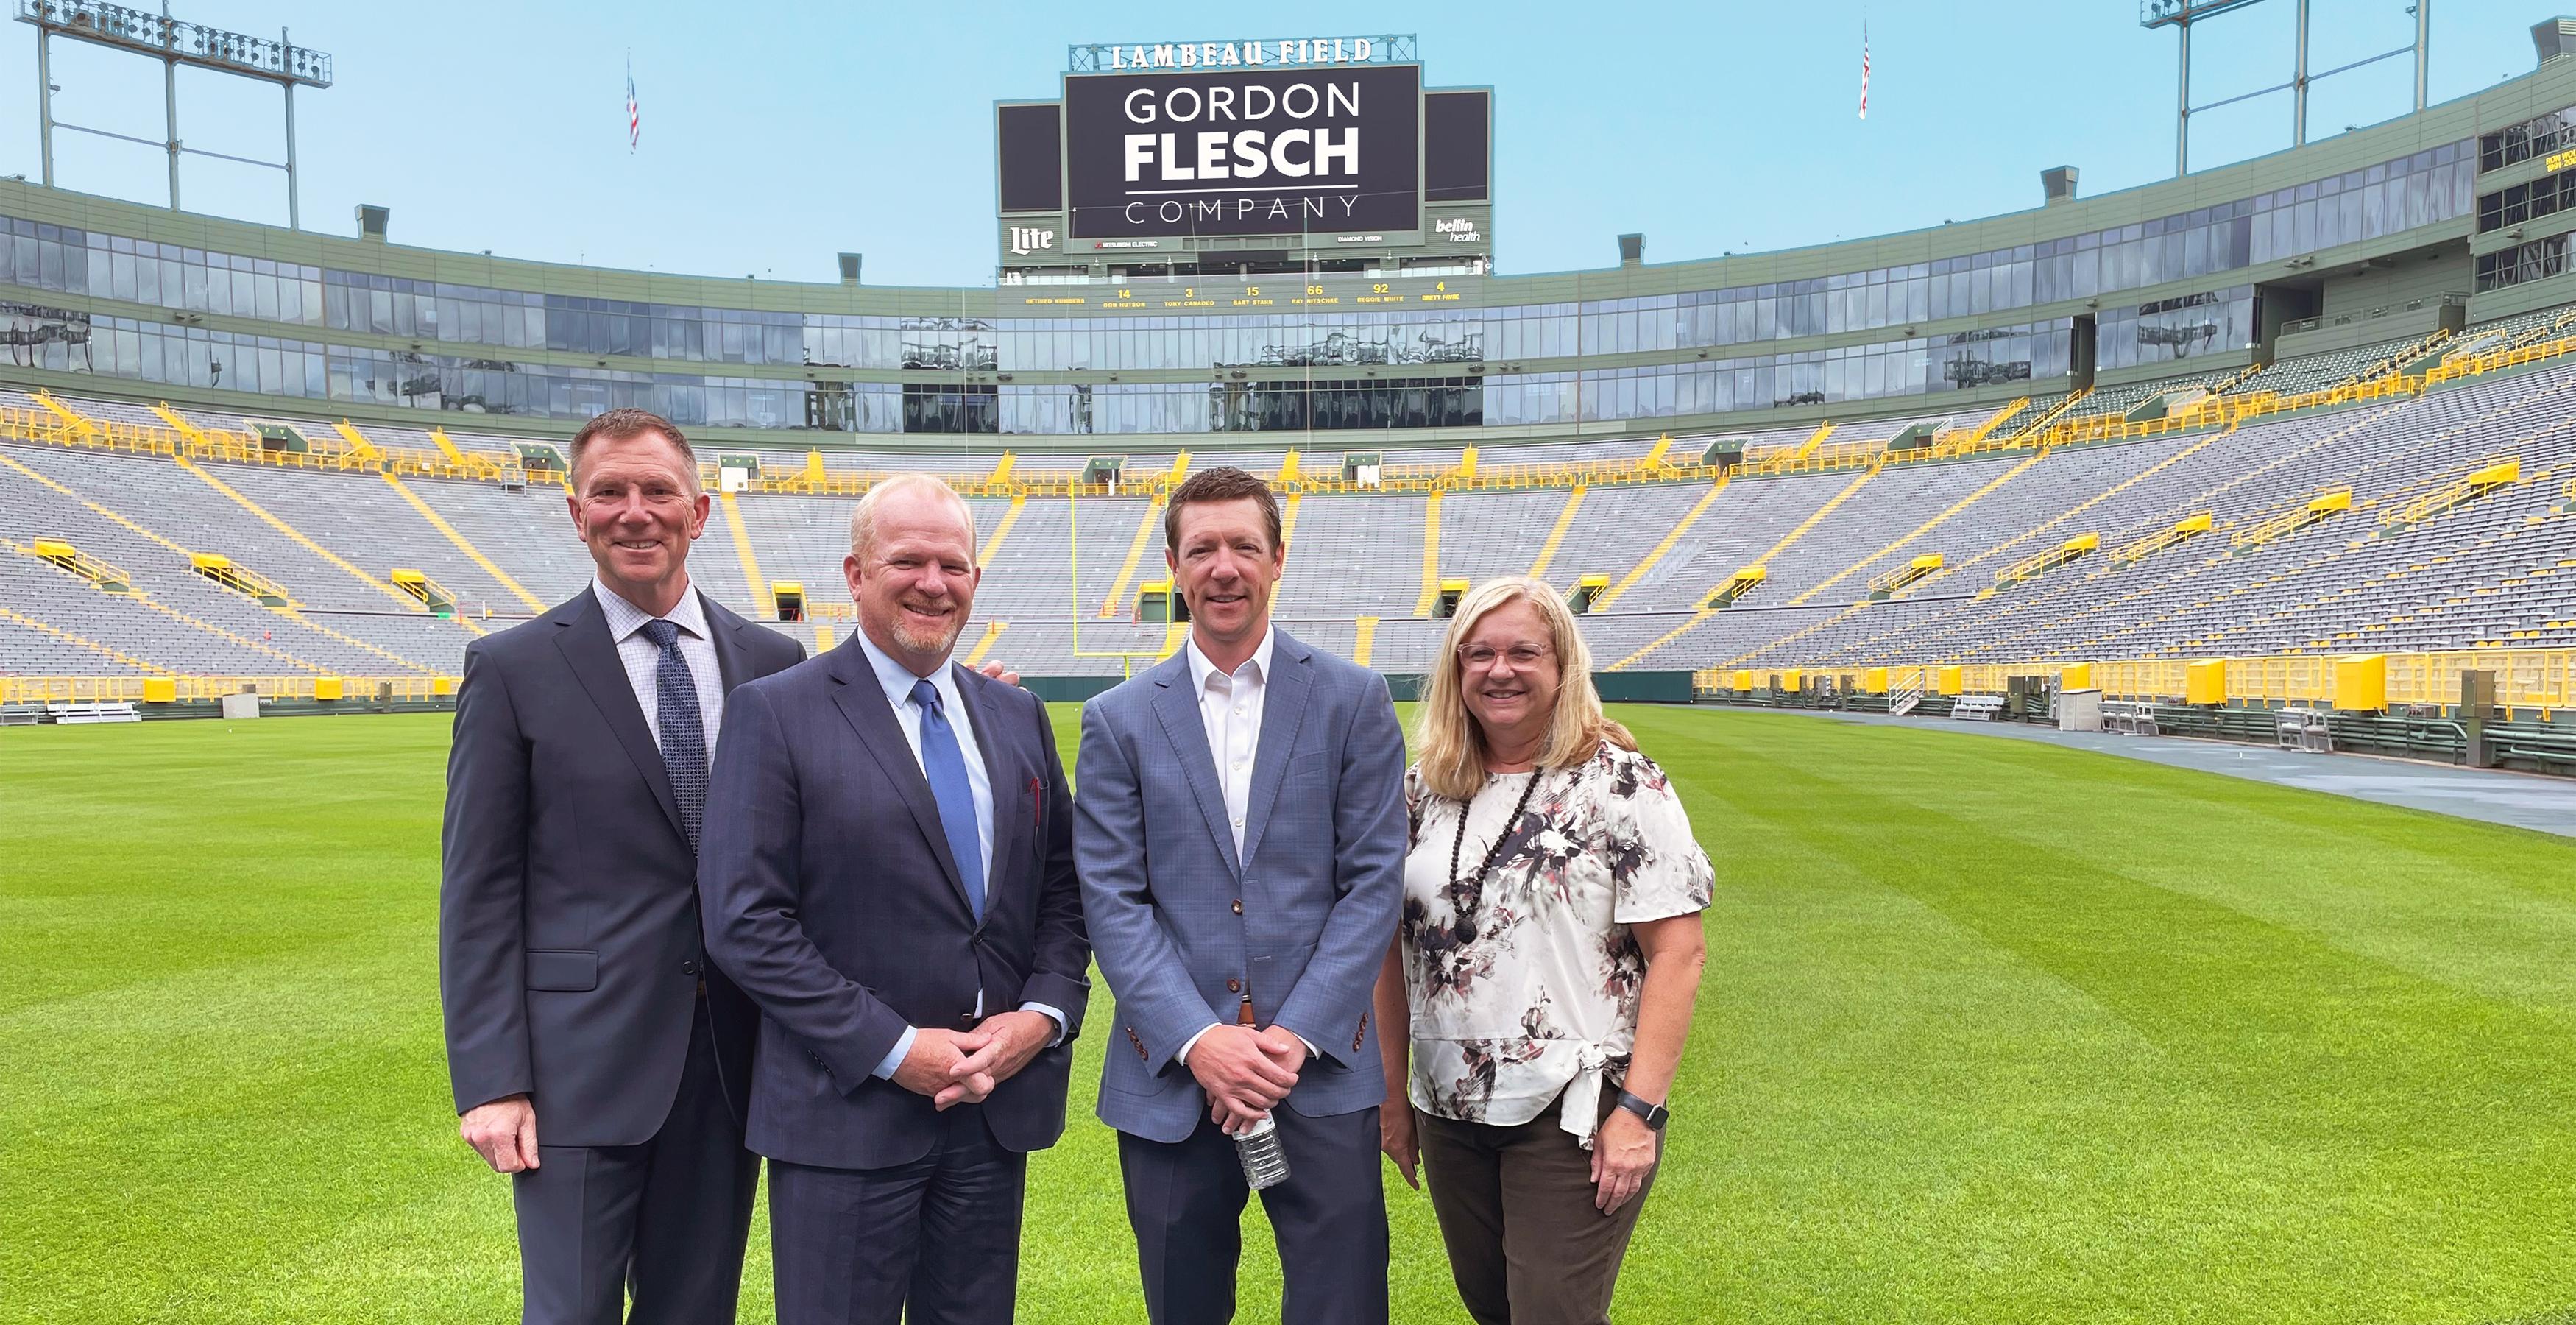 Green Bay Packers, Gordon Flesch Company Announce New Partnership